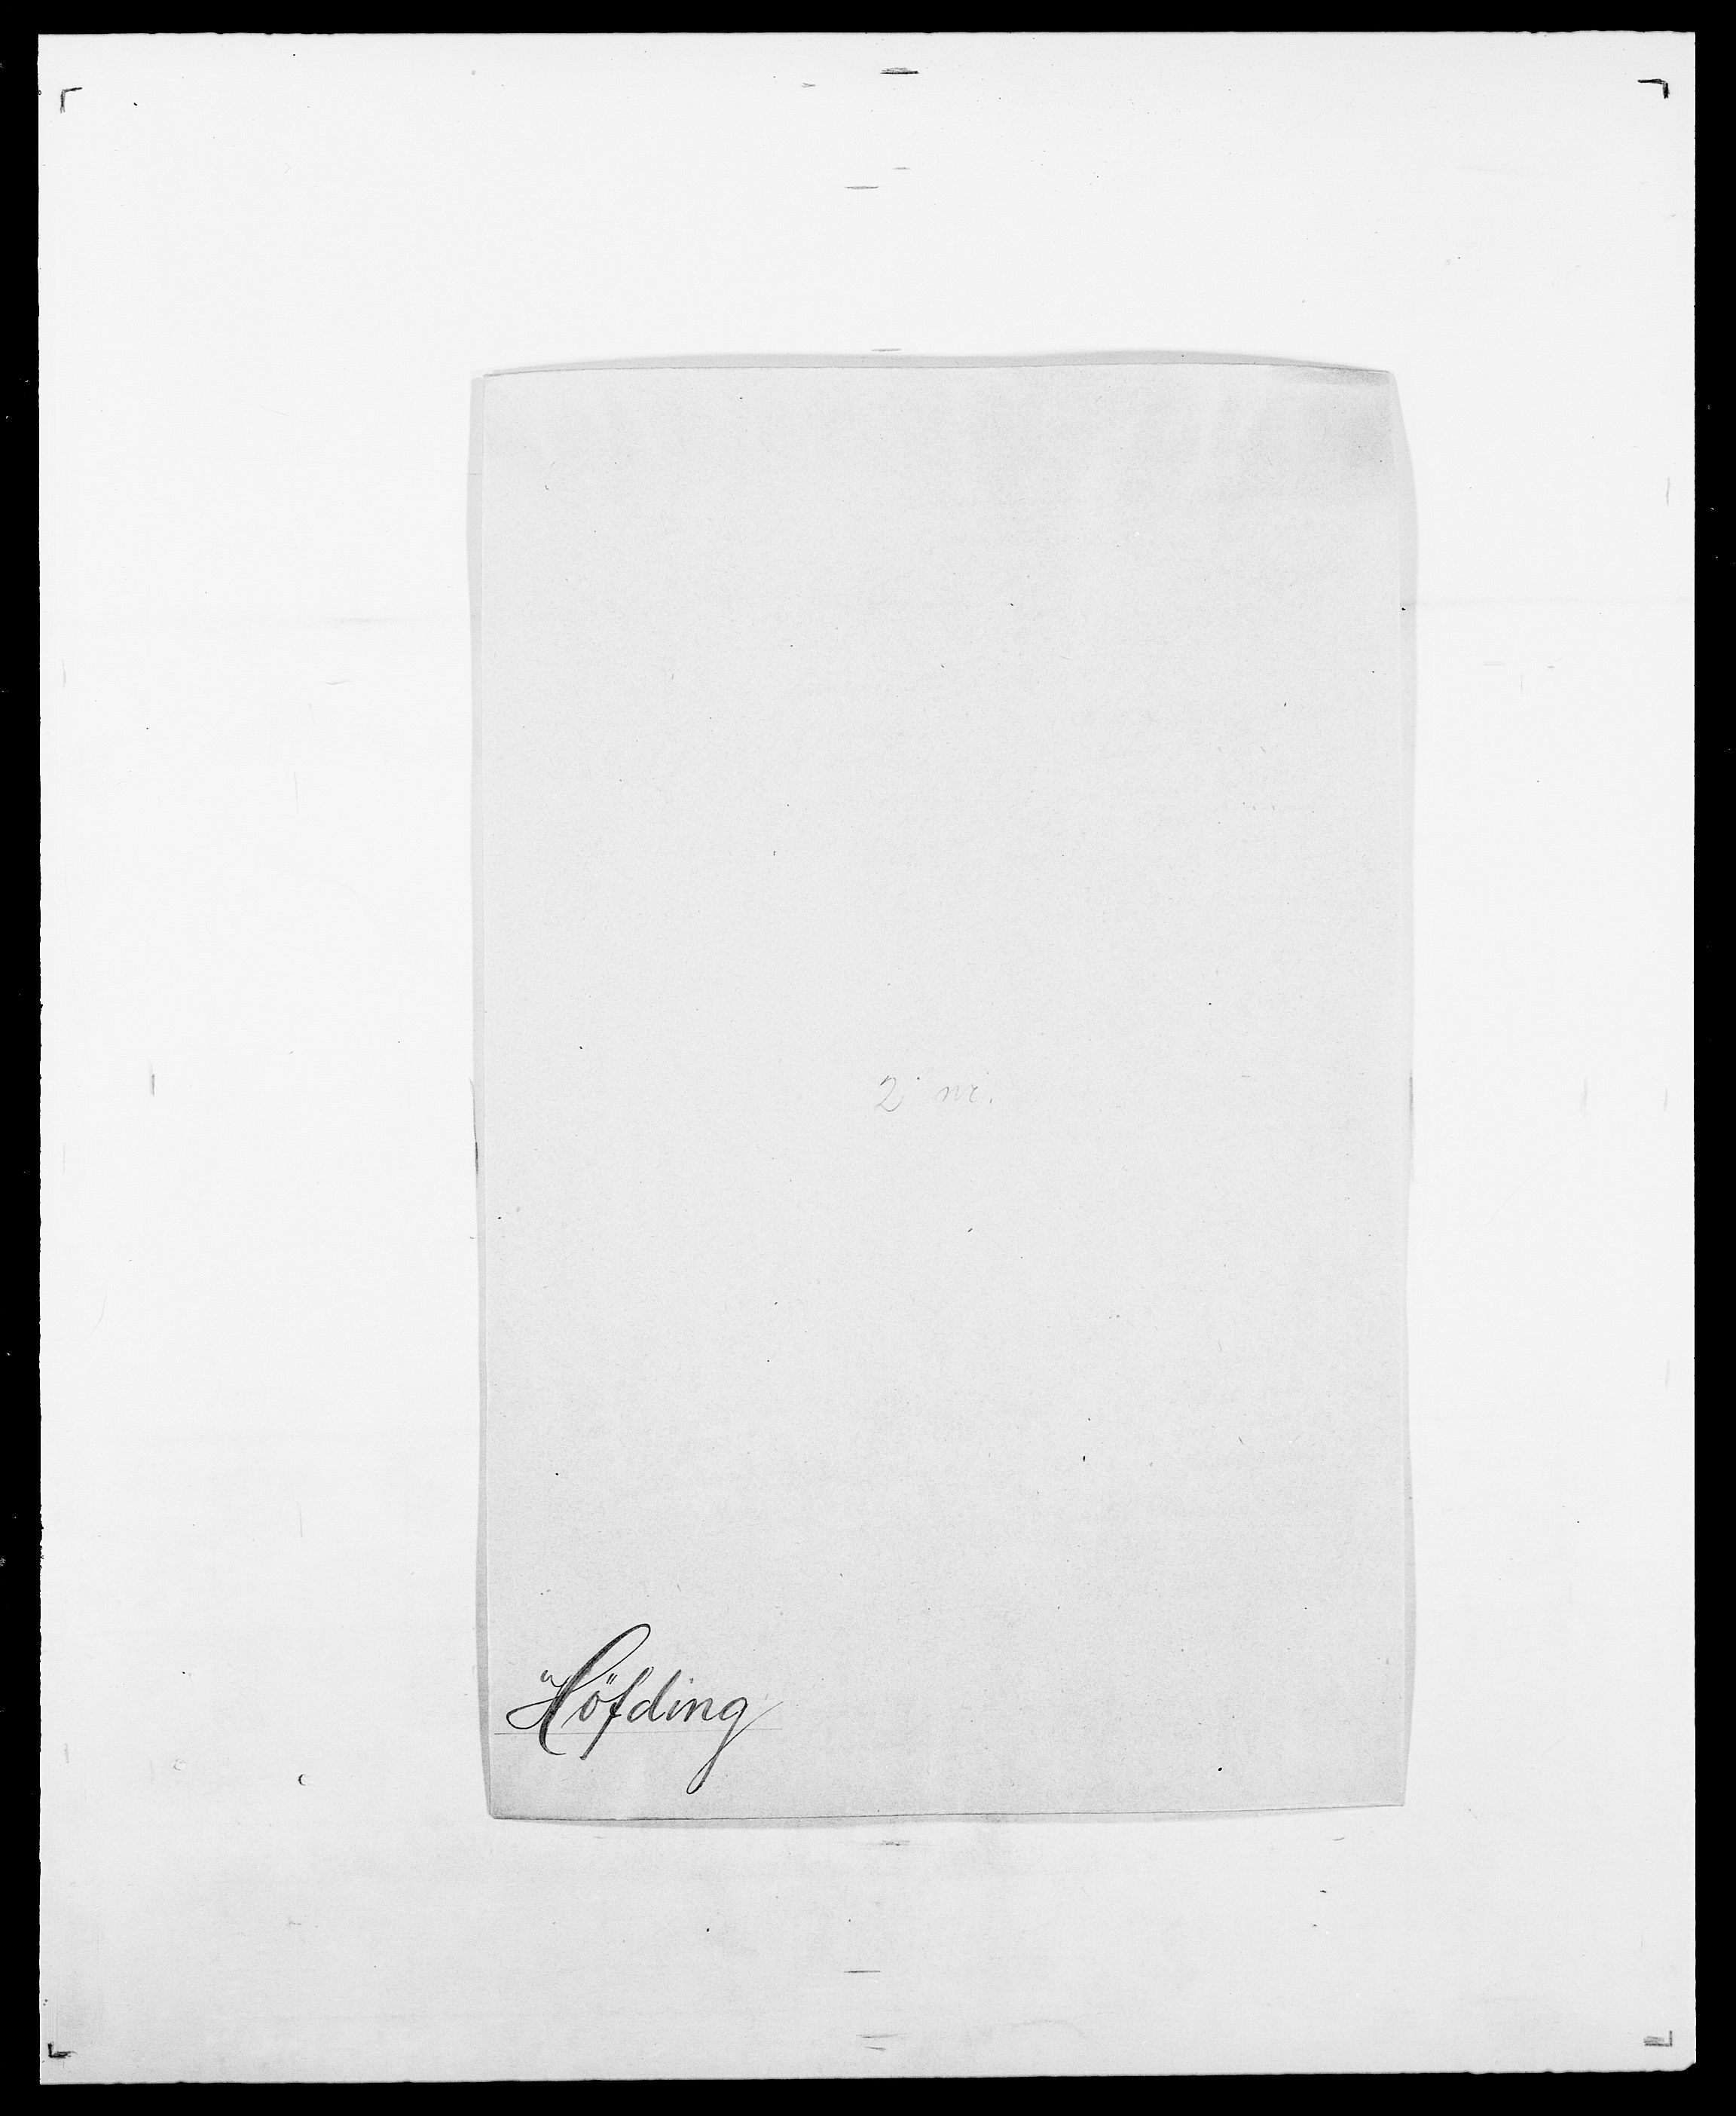 SAO, Delgobe, Charles Antoine - samling, D/Da/L0019: van der Hude - Joys, s. 344